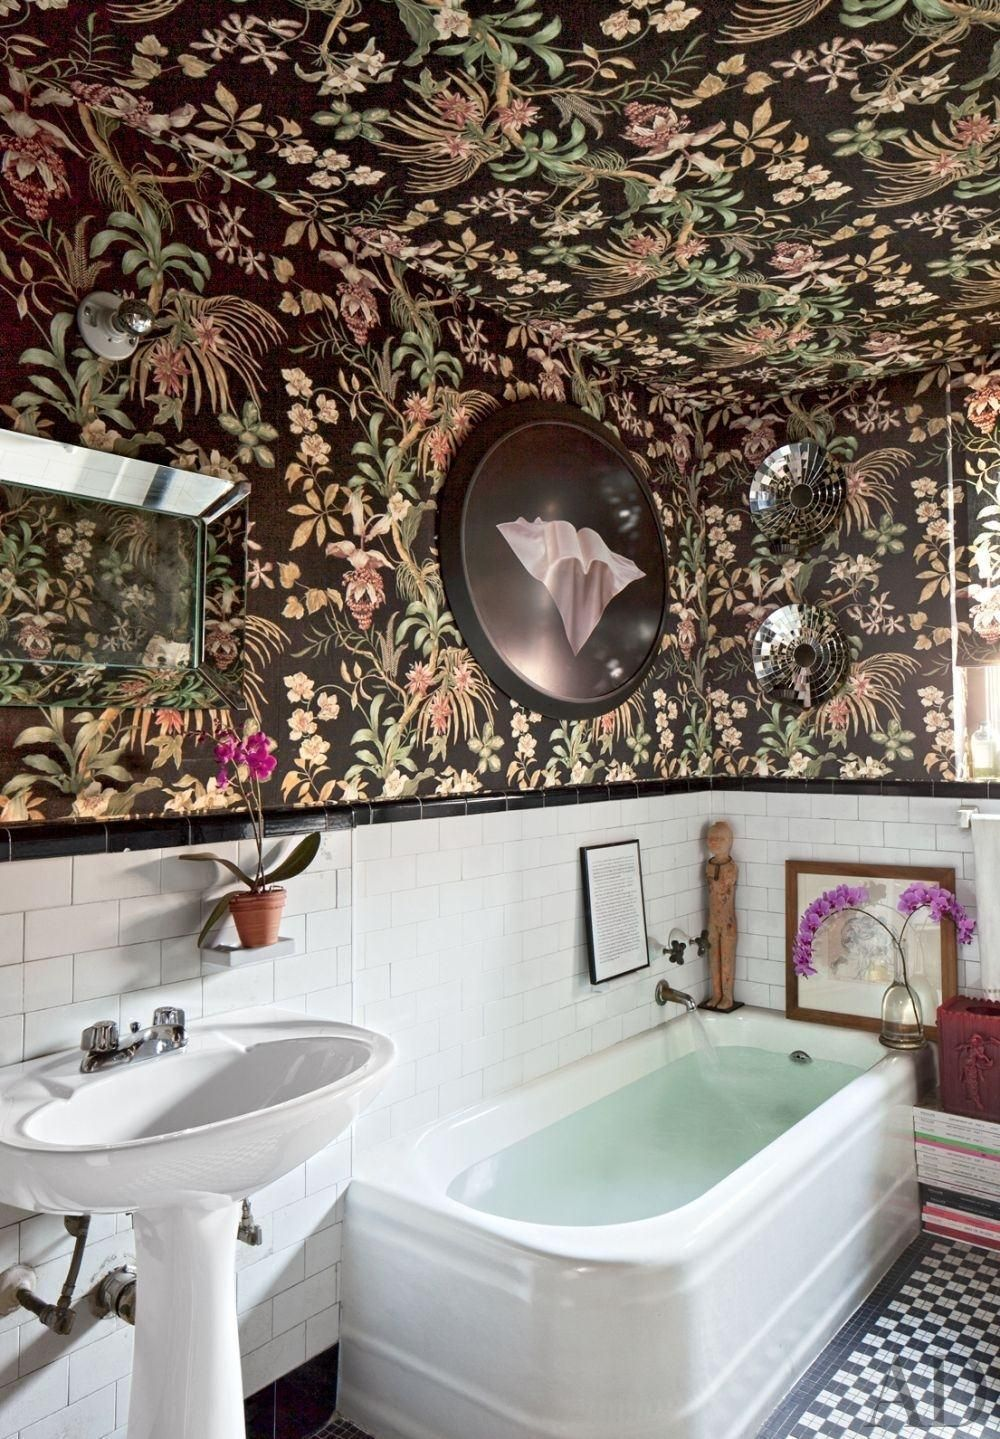 Decke Wallpaper 60 Fotos Und Referenzen Bedroom Ceiling Timorousbeasties Bathroom Bla Badezimmer Innenausstattung Badezimmereinrichtung Badezimmer Dekor